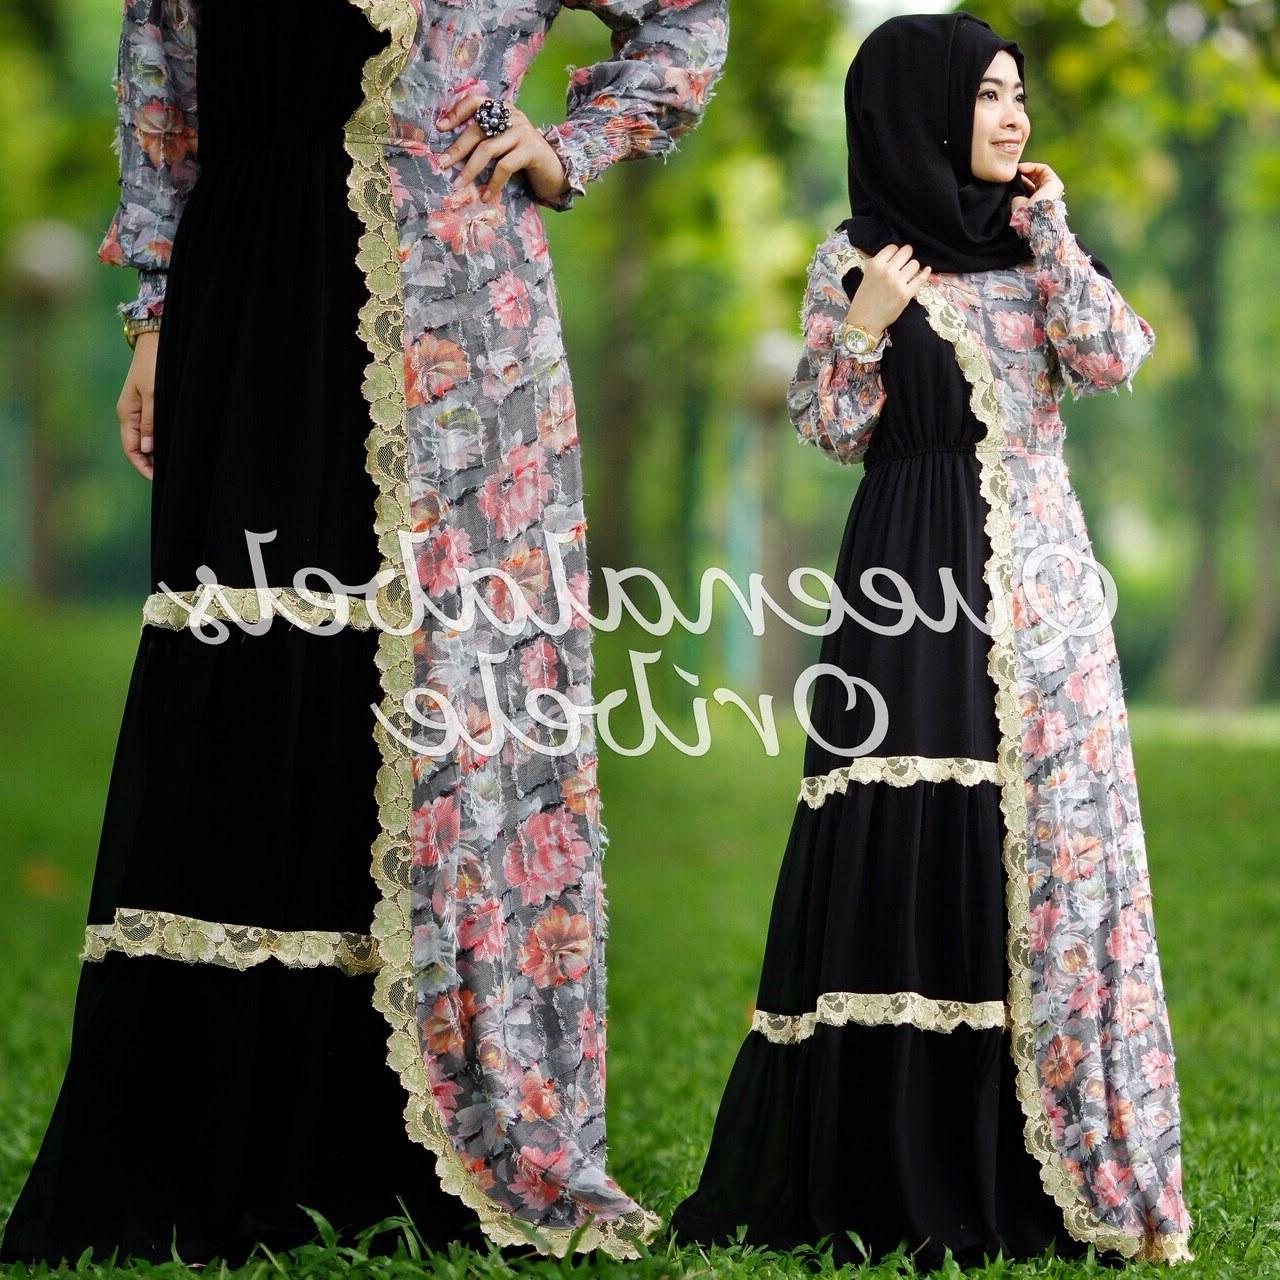 Model Baju Lebaran Ala Syahrini 9ddf Baju Gamis Terbaru Ala Syahrini oribele Dress by